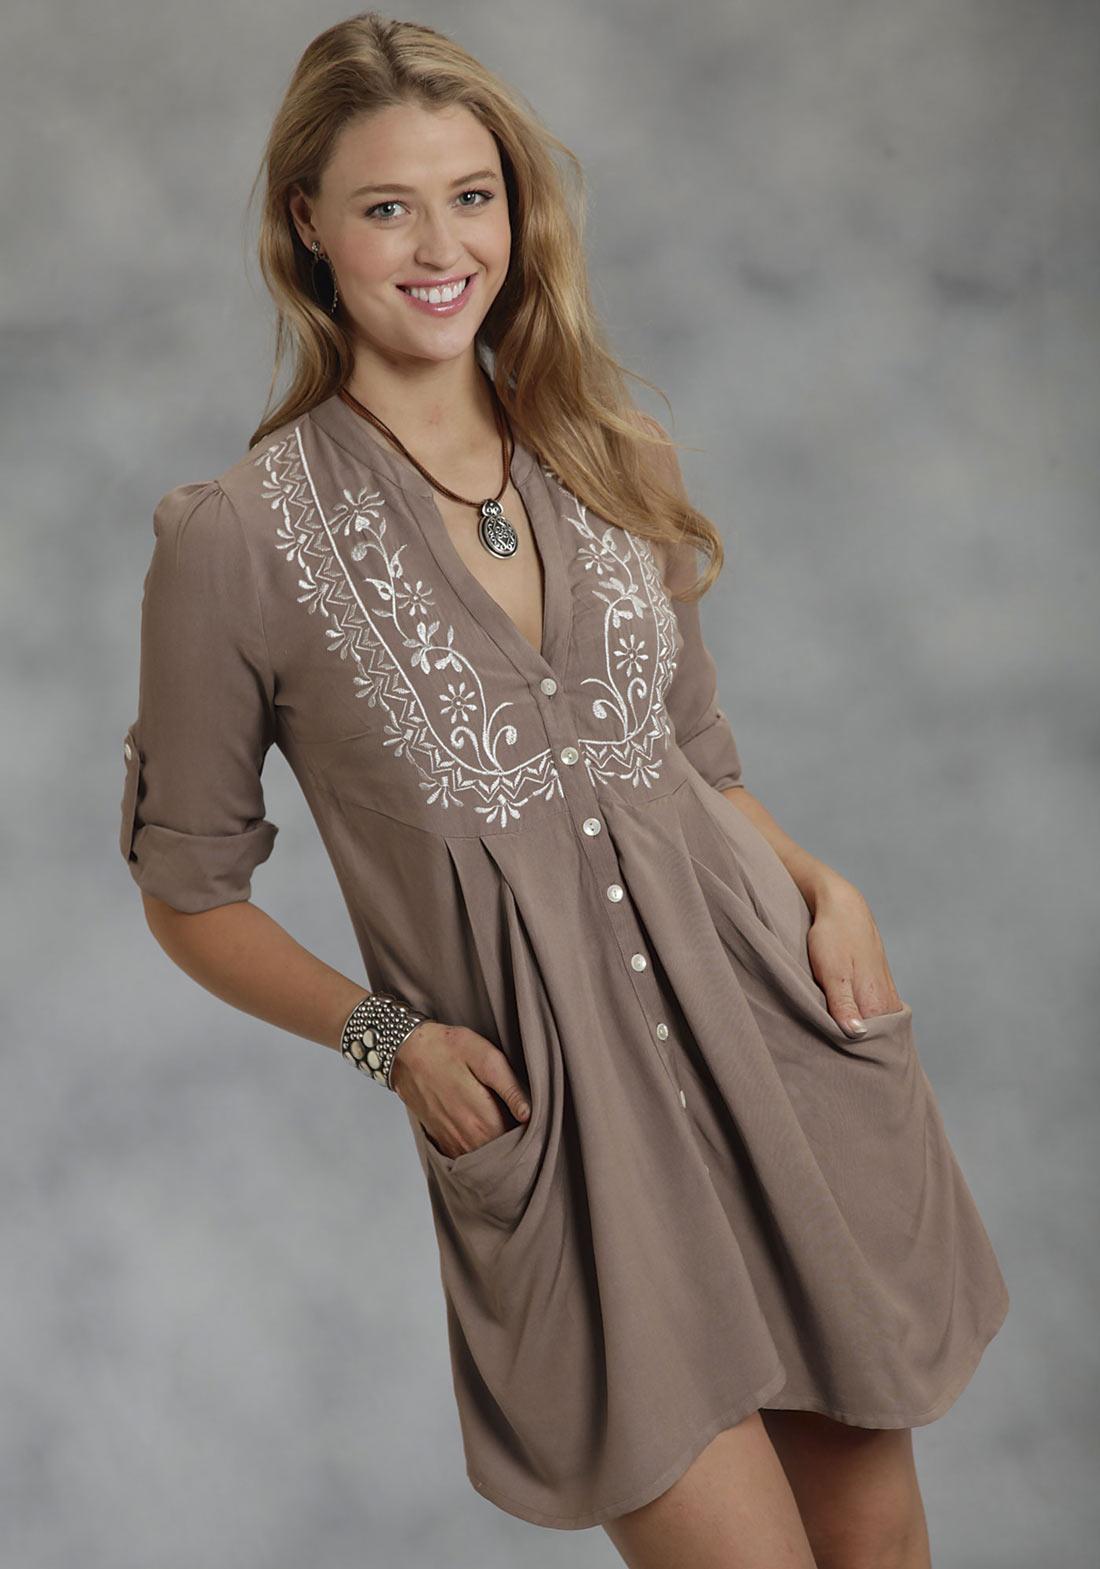 Roper women 39 s rayon tunic w embroidery for Womens denim tunic shirt